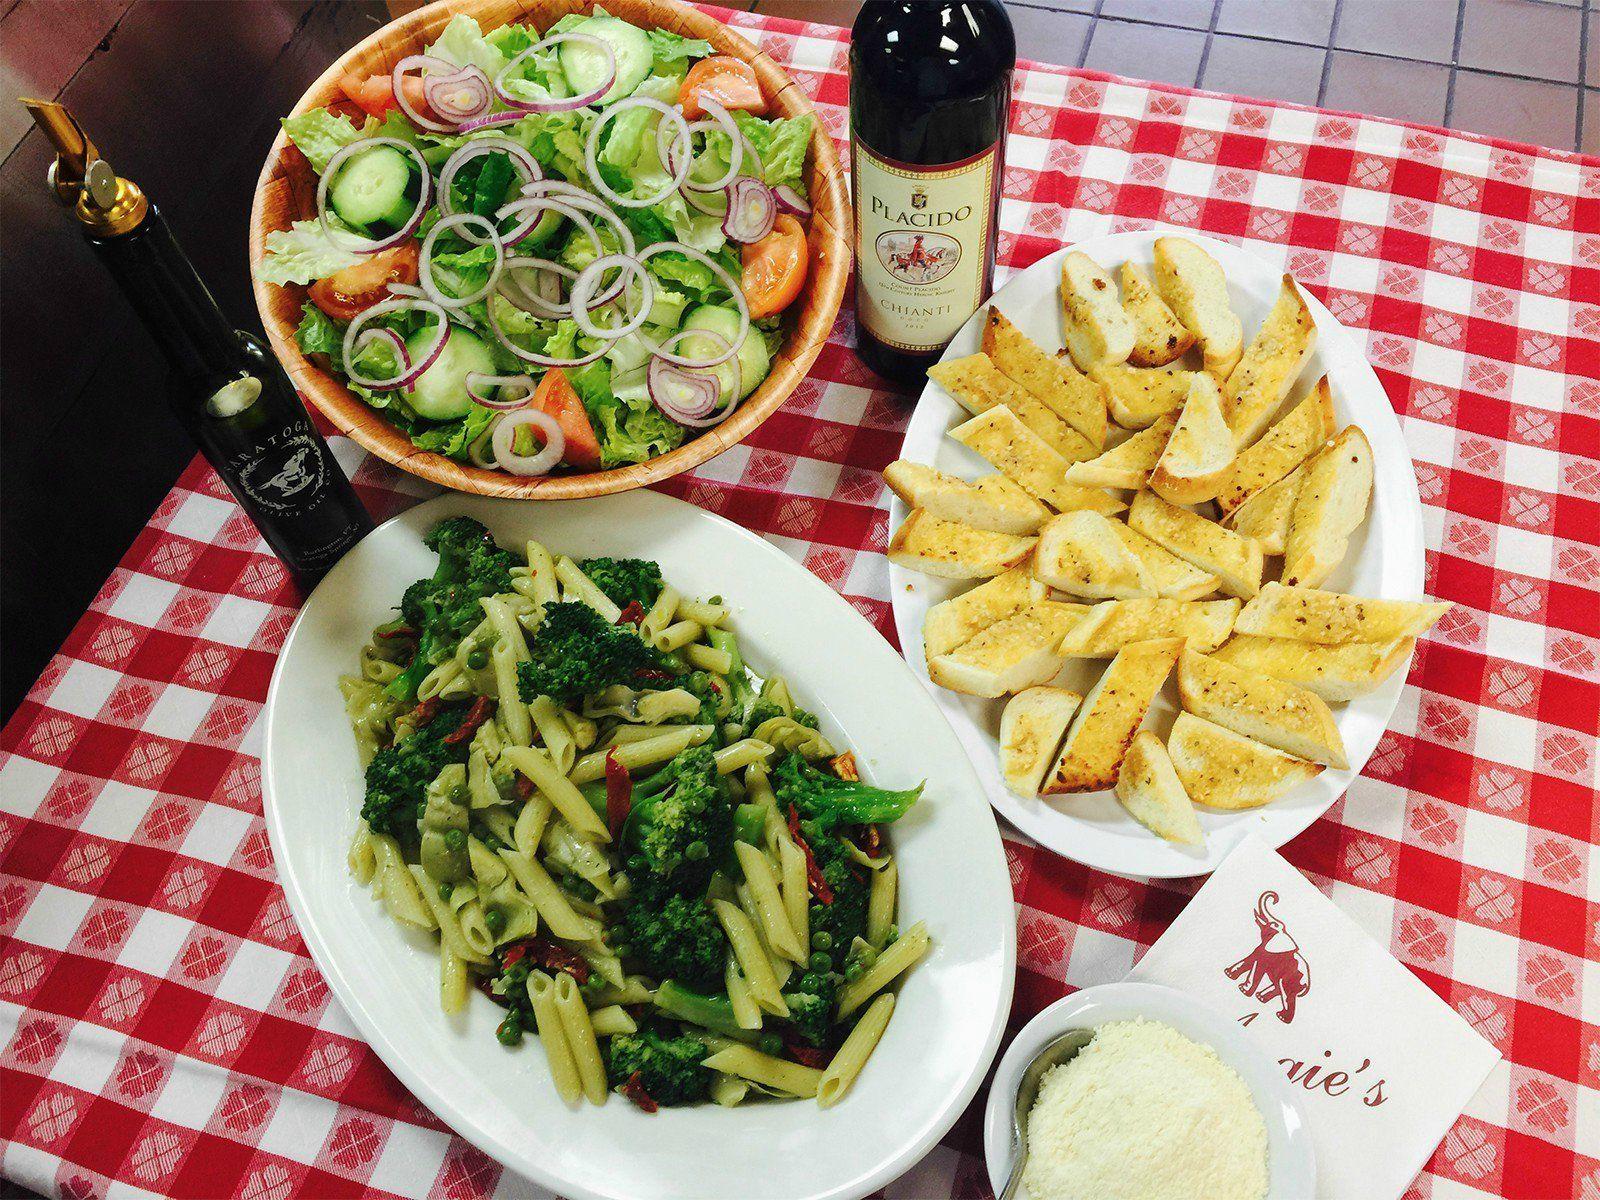 pasta-night-special-italian-food-augies-family-style-italian-restaurant-ballston-spa-ny-cooking